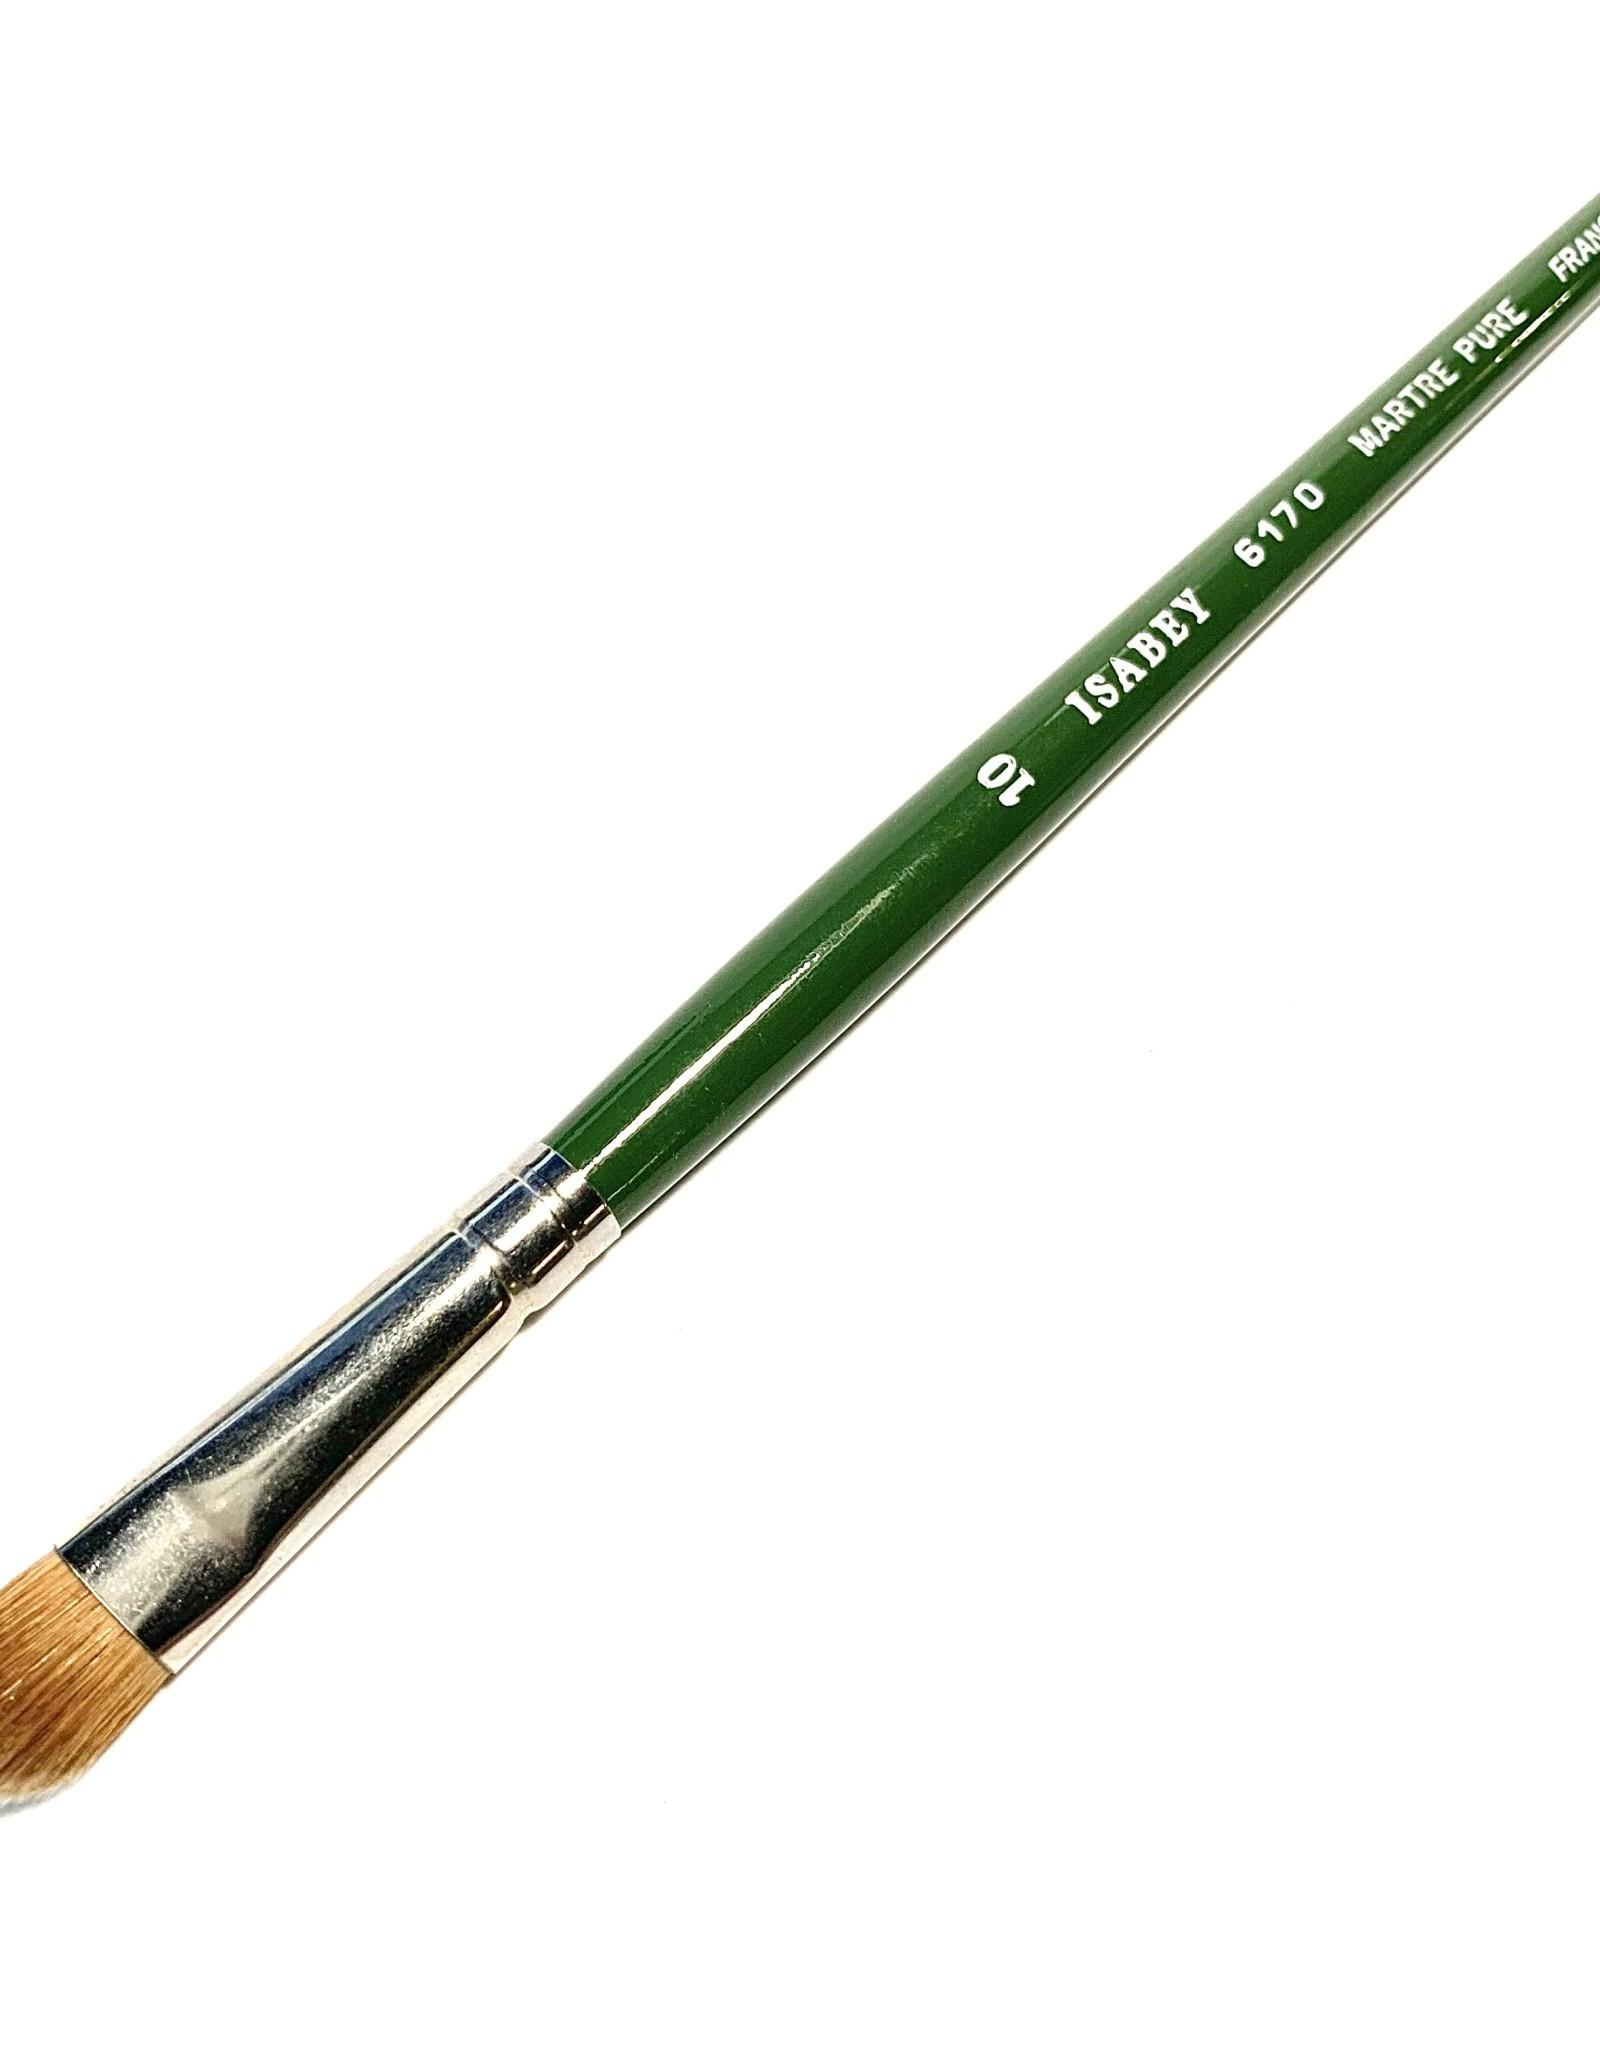 Isabey Kolinsky Sable Fat Brush, Filbert 6170 #10